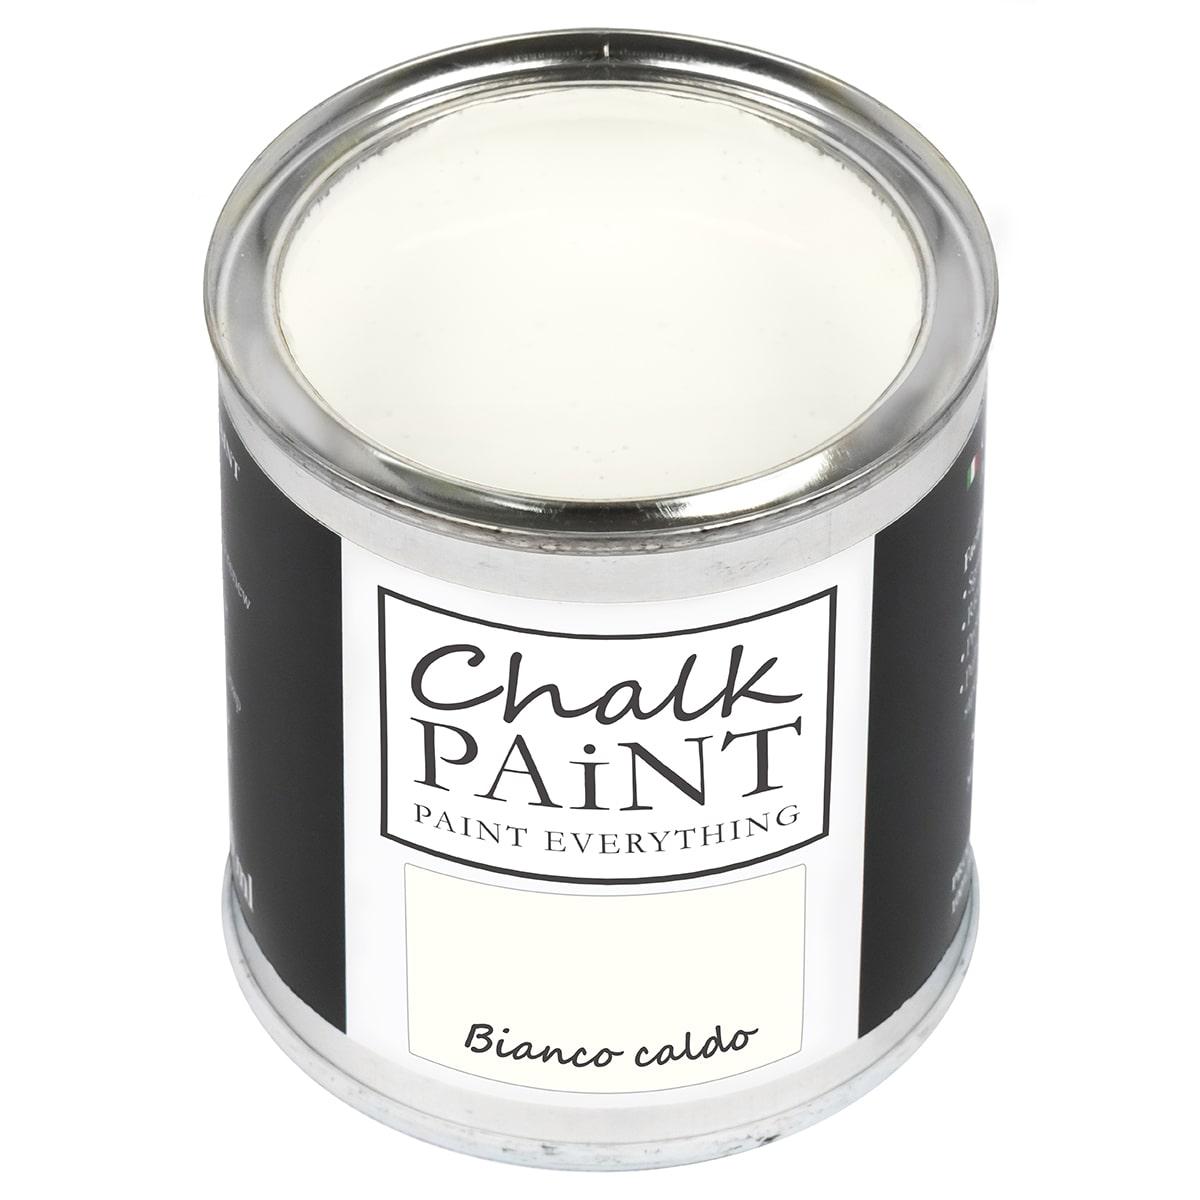 Chalk paint bianco caldo